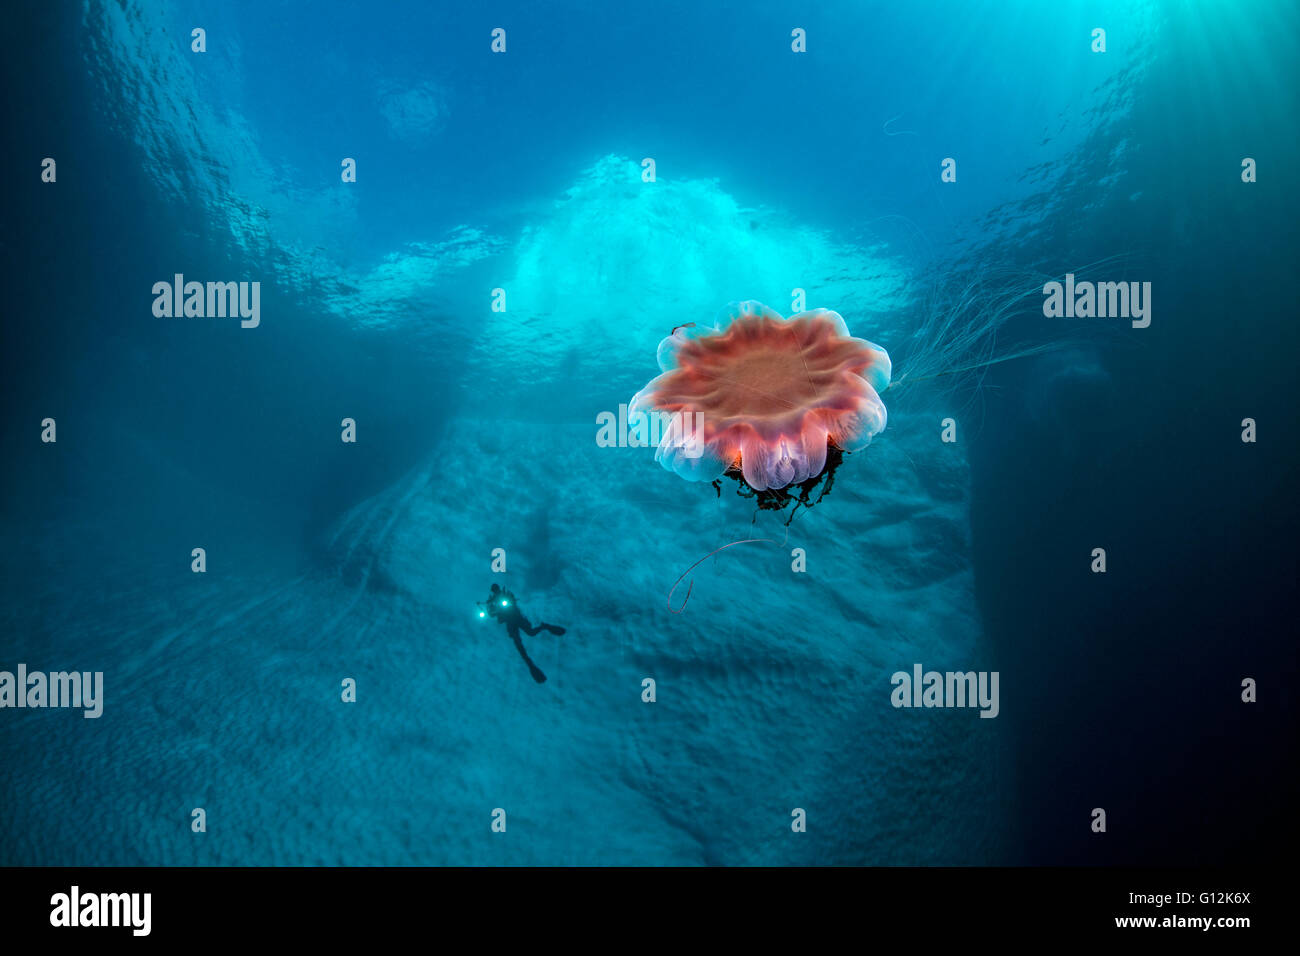 Lions Mane Jellyfish under Iceberg, Cyanea capillata, Tasiilaq, Greenland - Stock Image